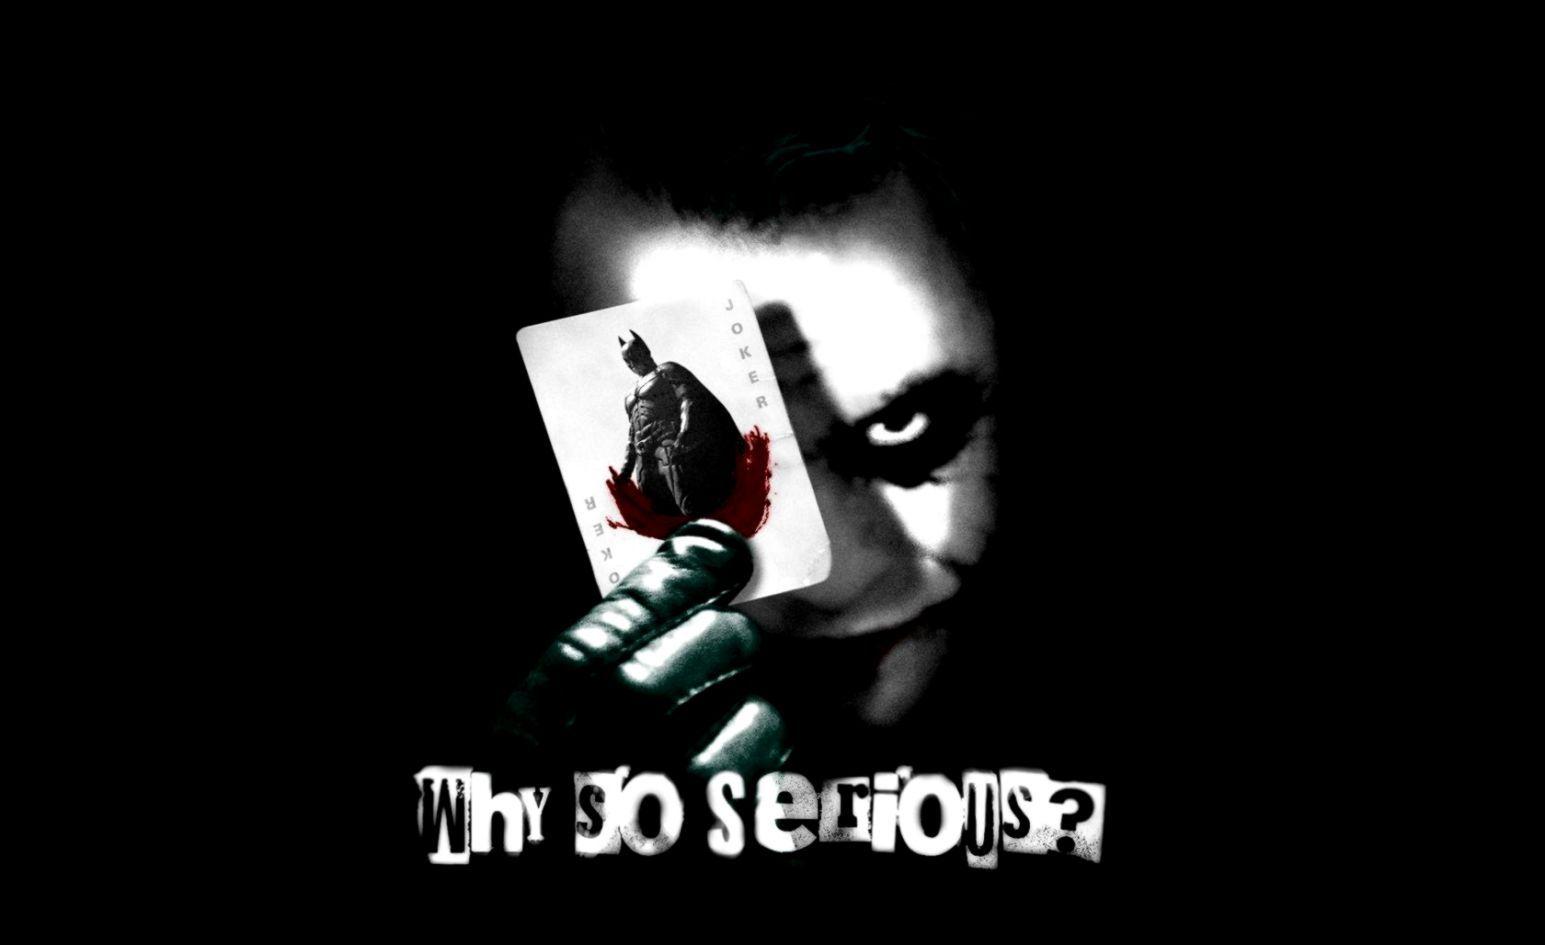 Joker Black And White Wallpapers Wallpaper Cave